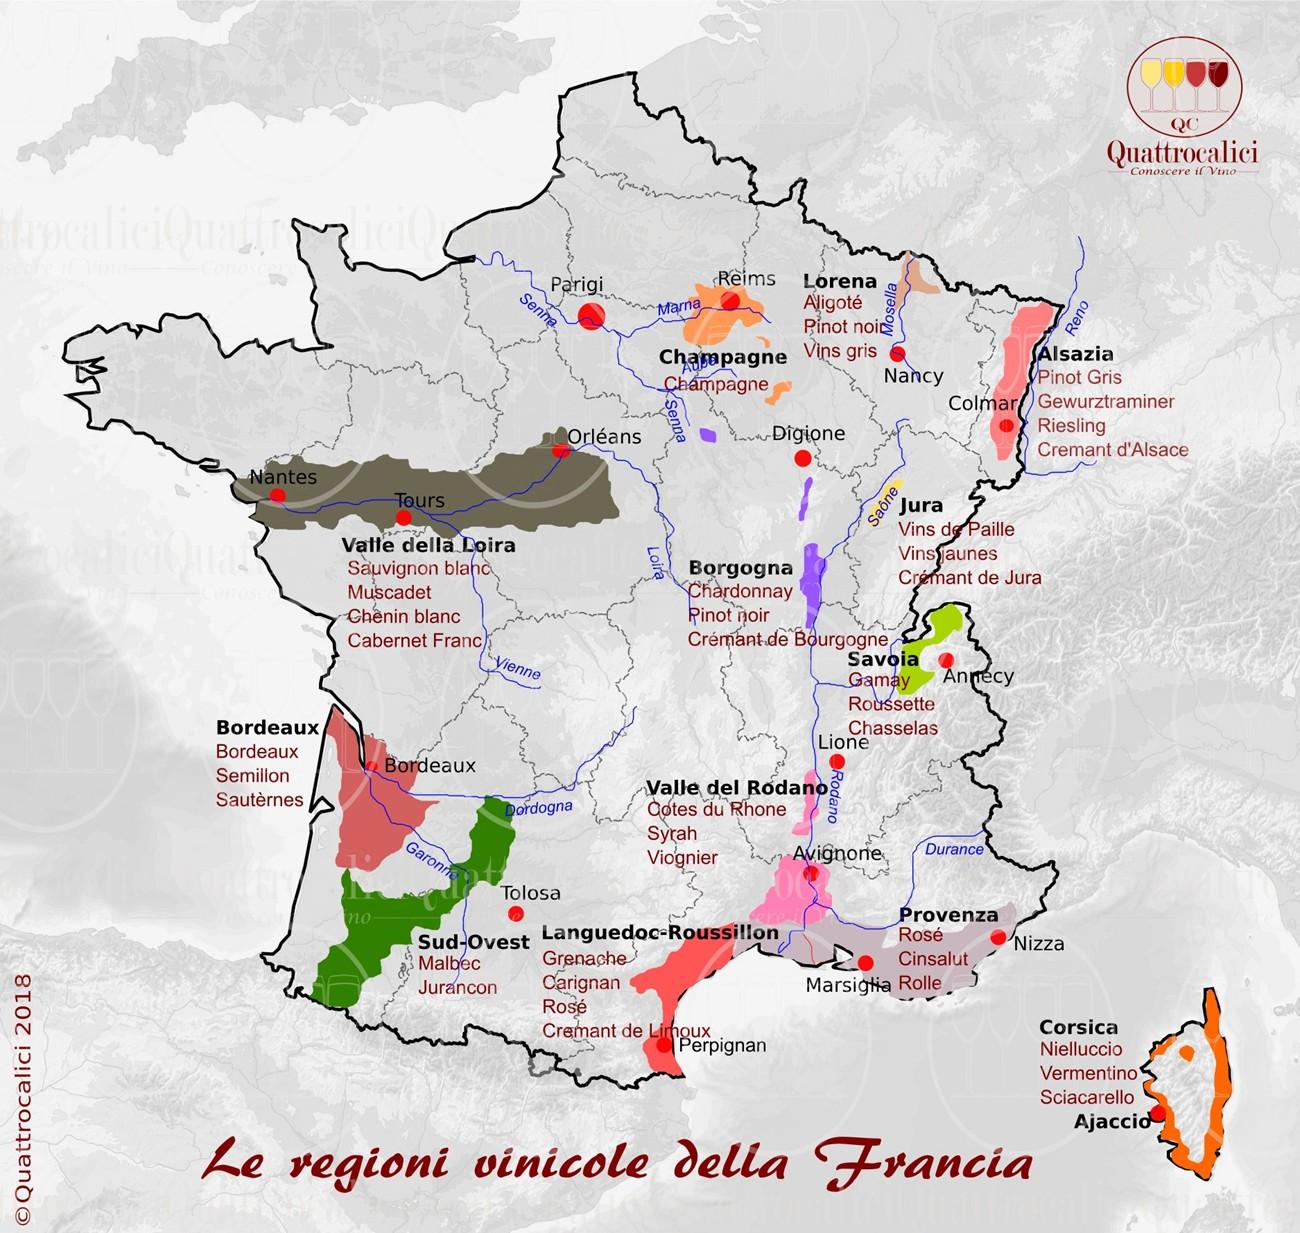 Francia - Regioni del vino